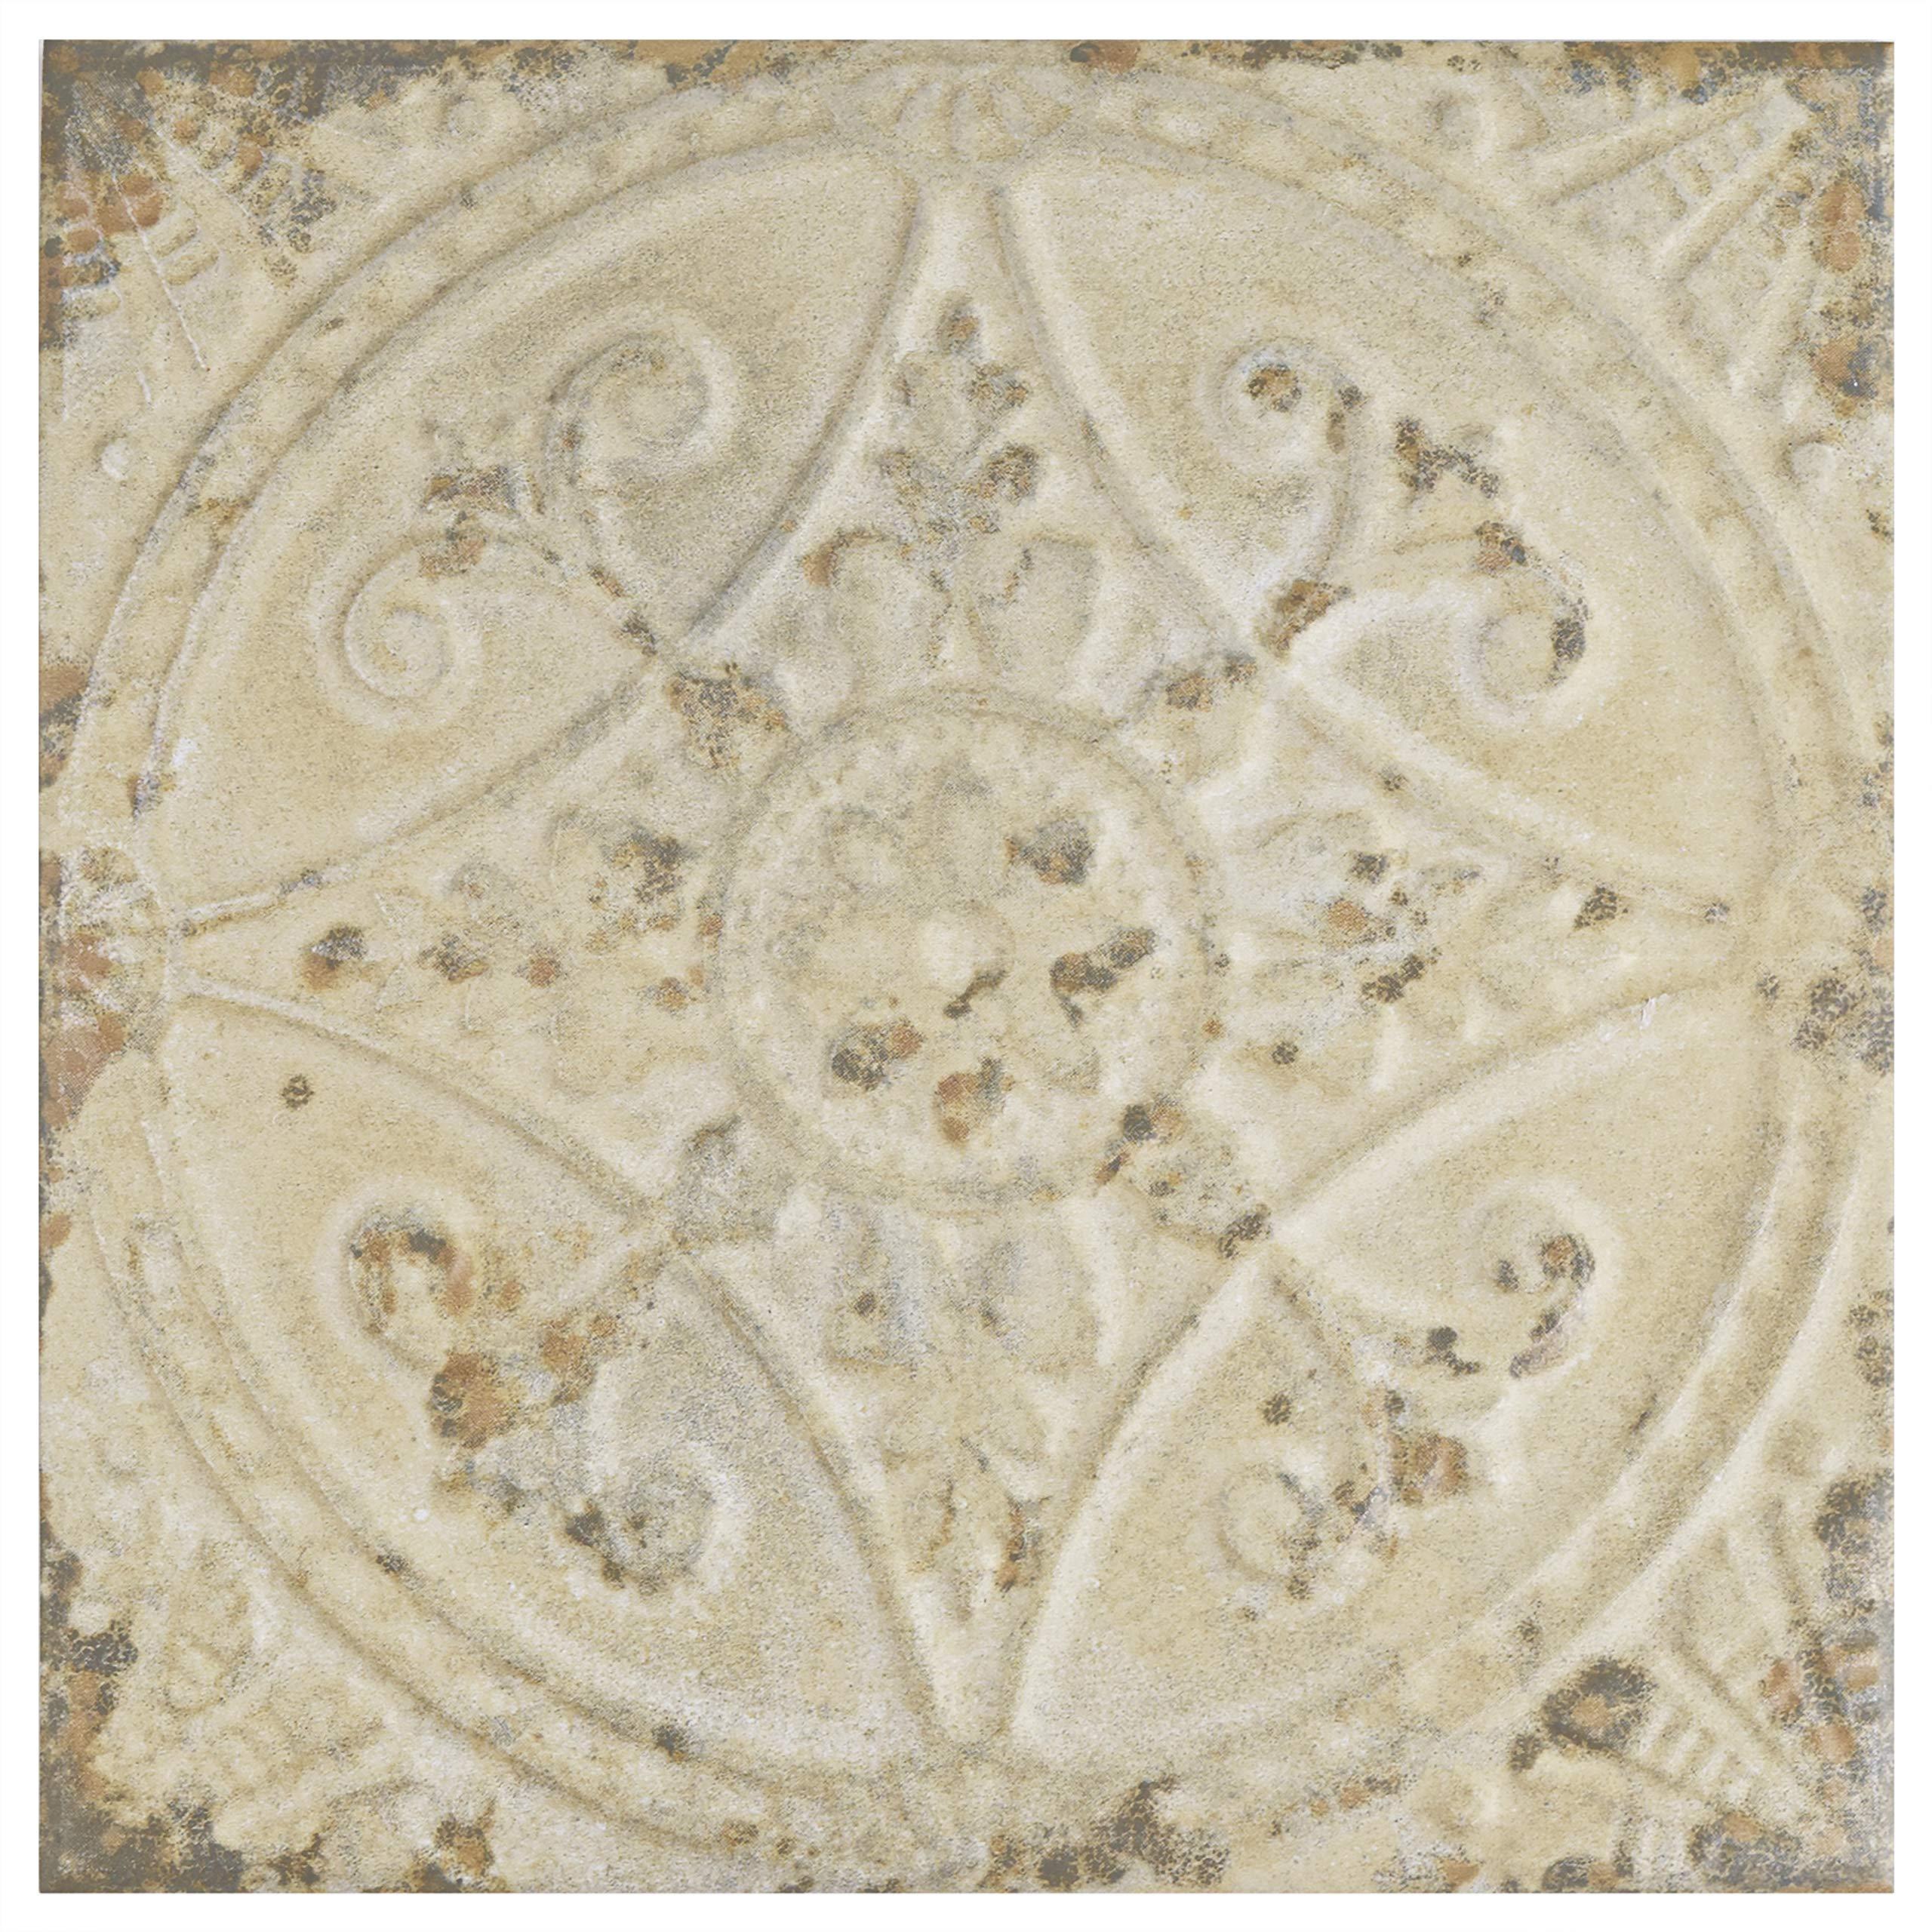 SomerTile FPESAJB Murcia Ceramic Floor and Wall Tile, 13'' x 13'', Blanco